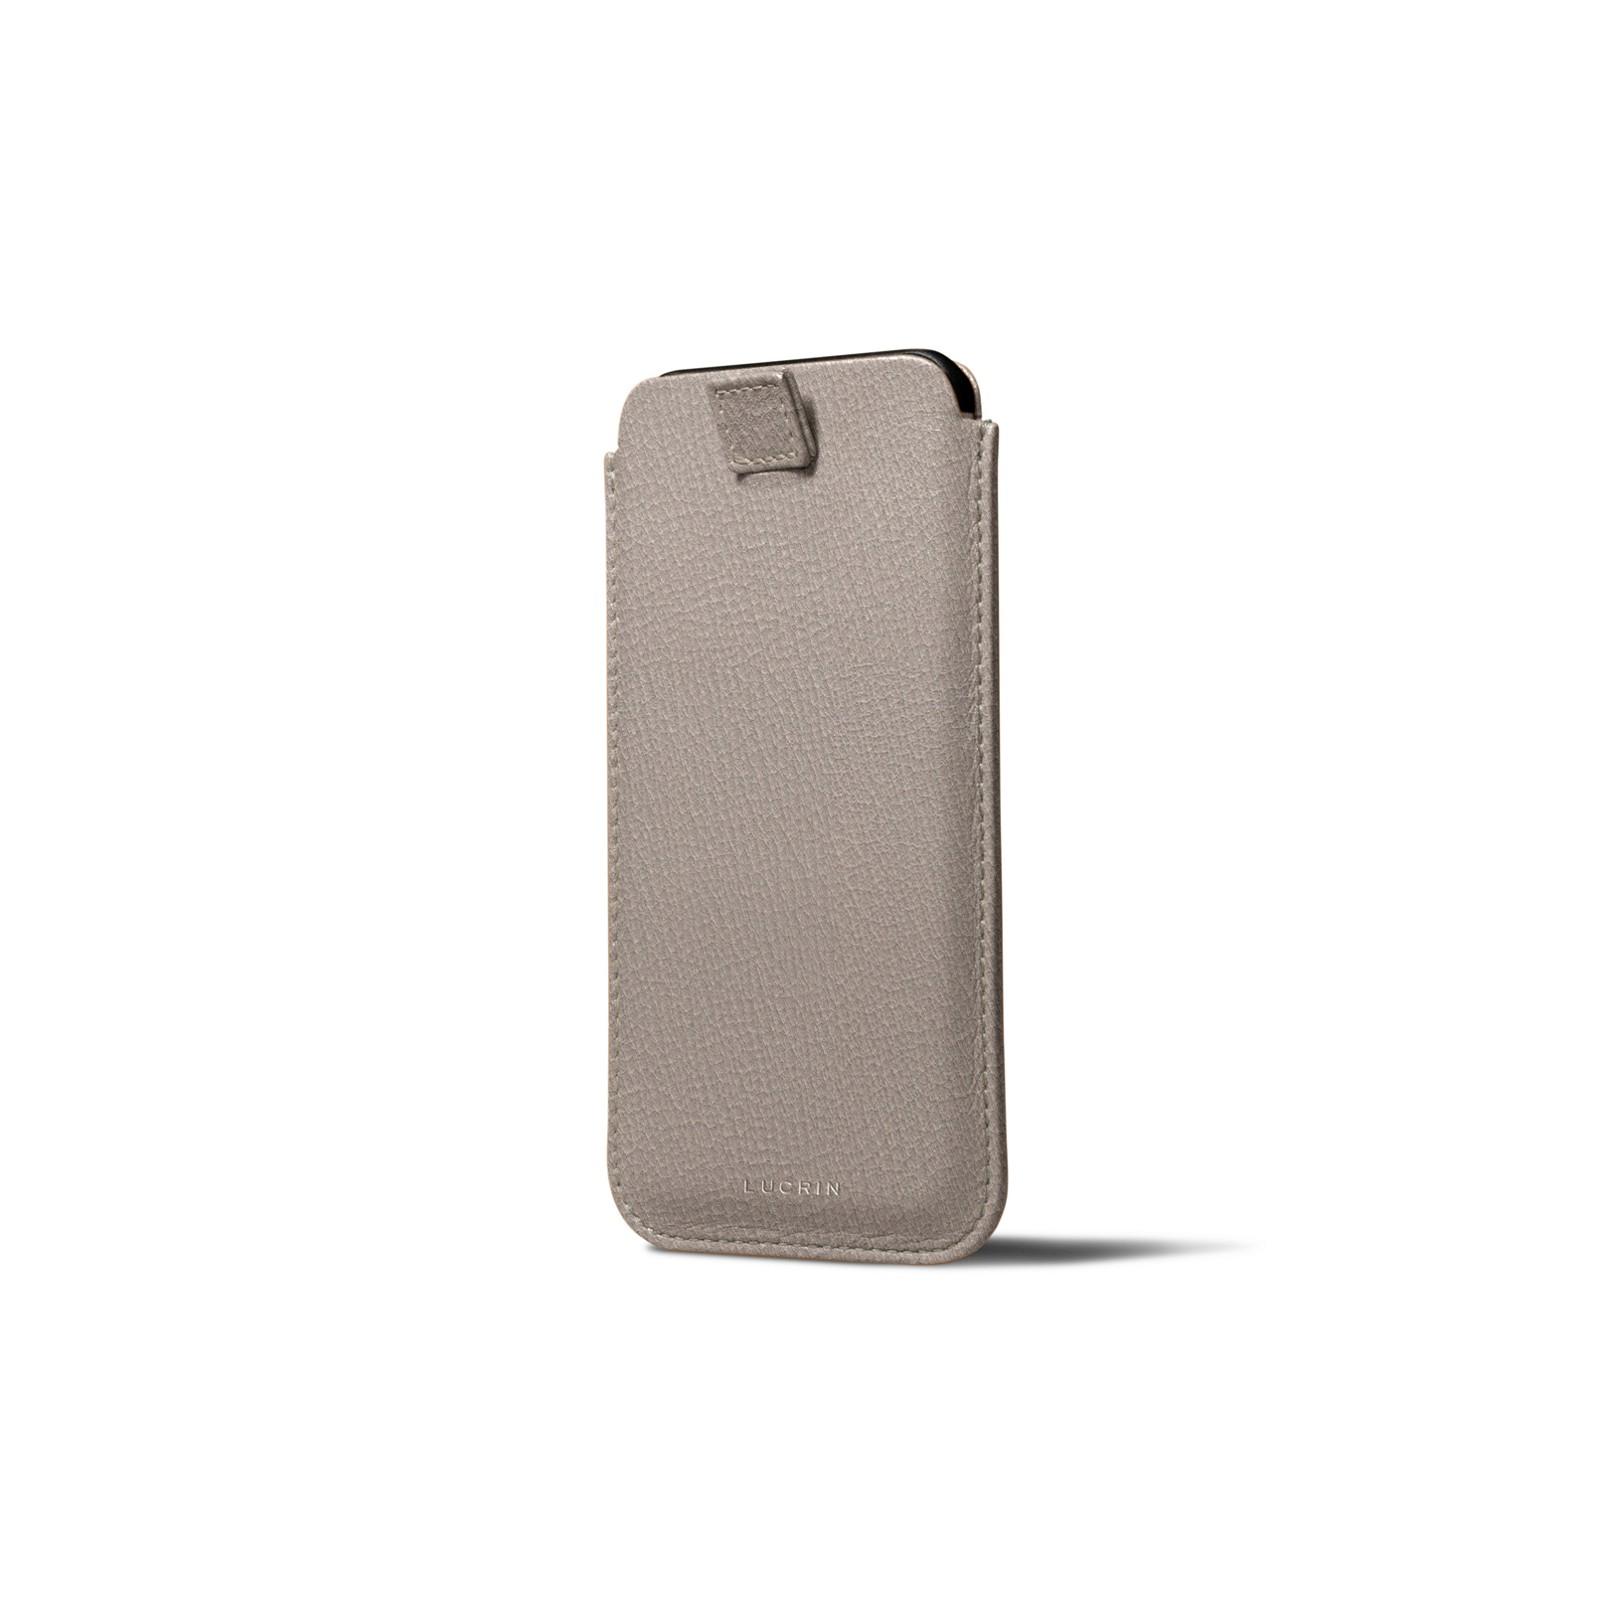 custodia lucrin iphone